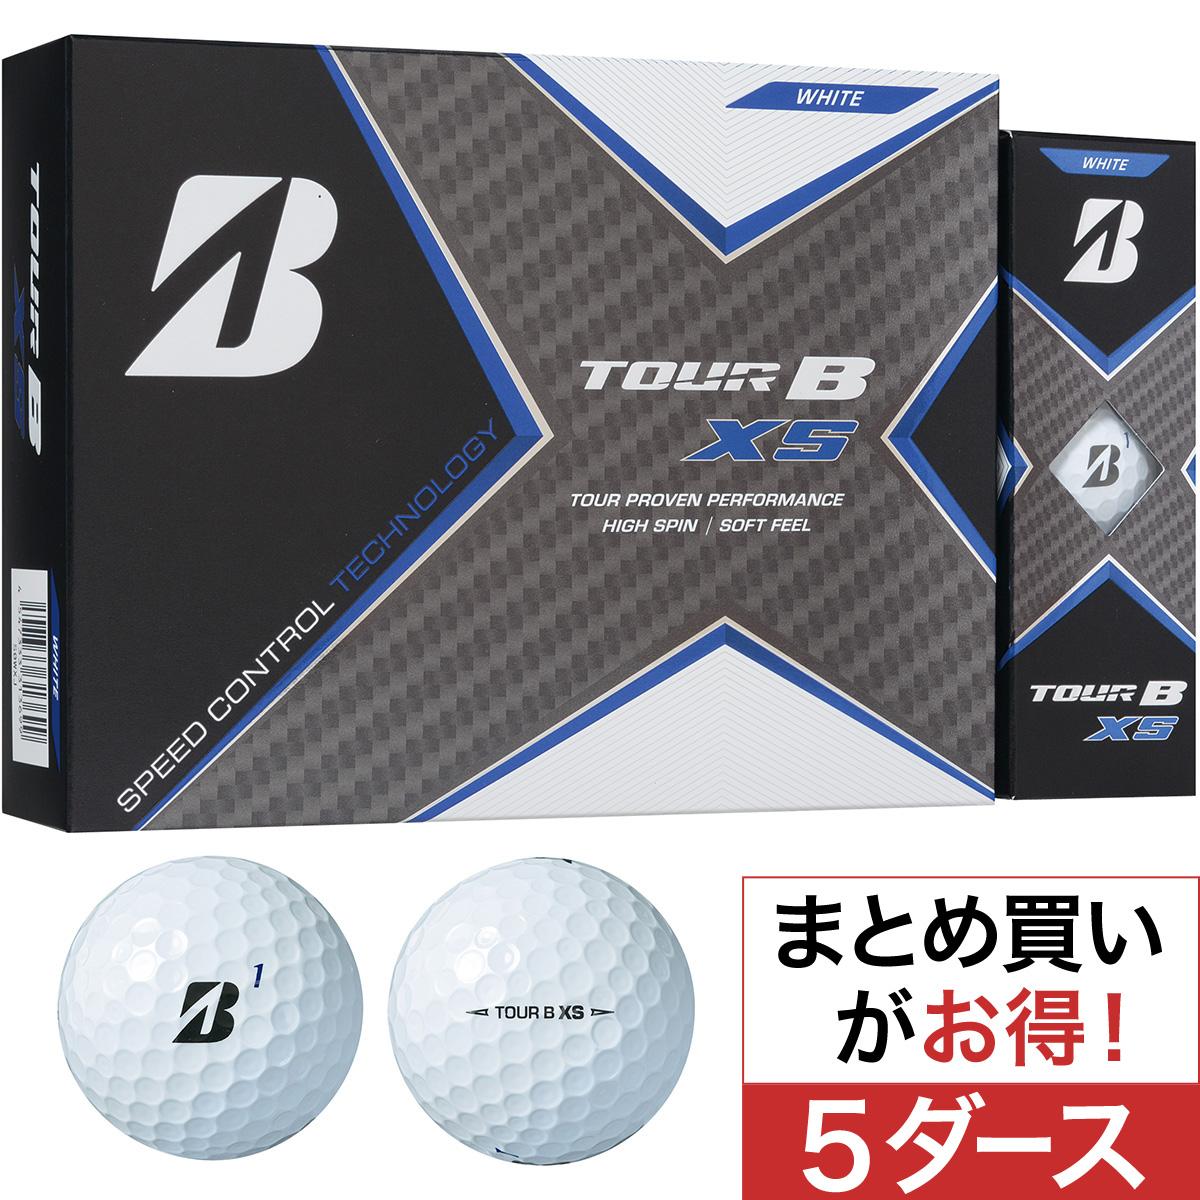 TOUR B XS ボール 5ダースセット